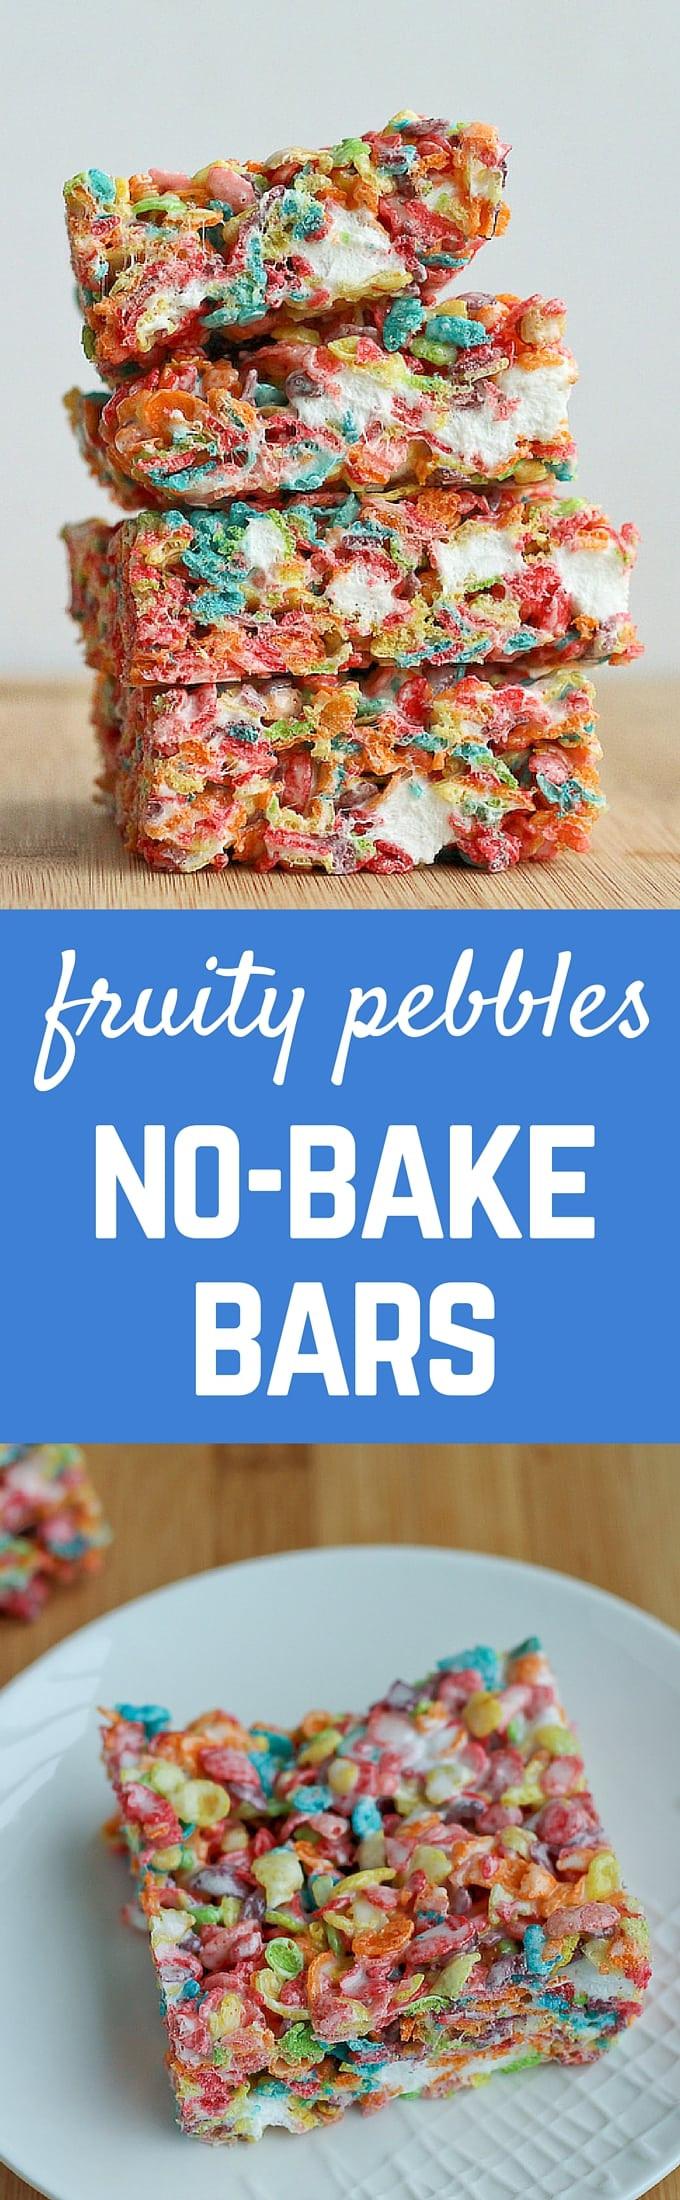 Fruity Pebbles Desserts  Fruity Pebbles No Bake Bars VIDEO Rachel Cooks